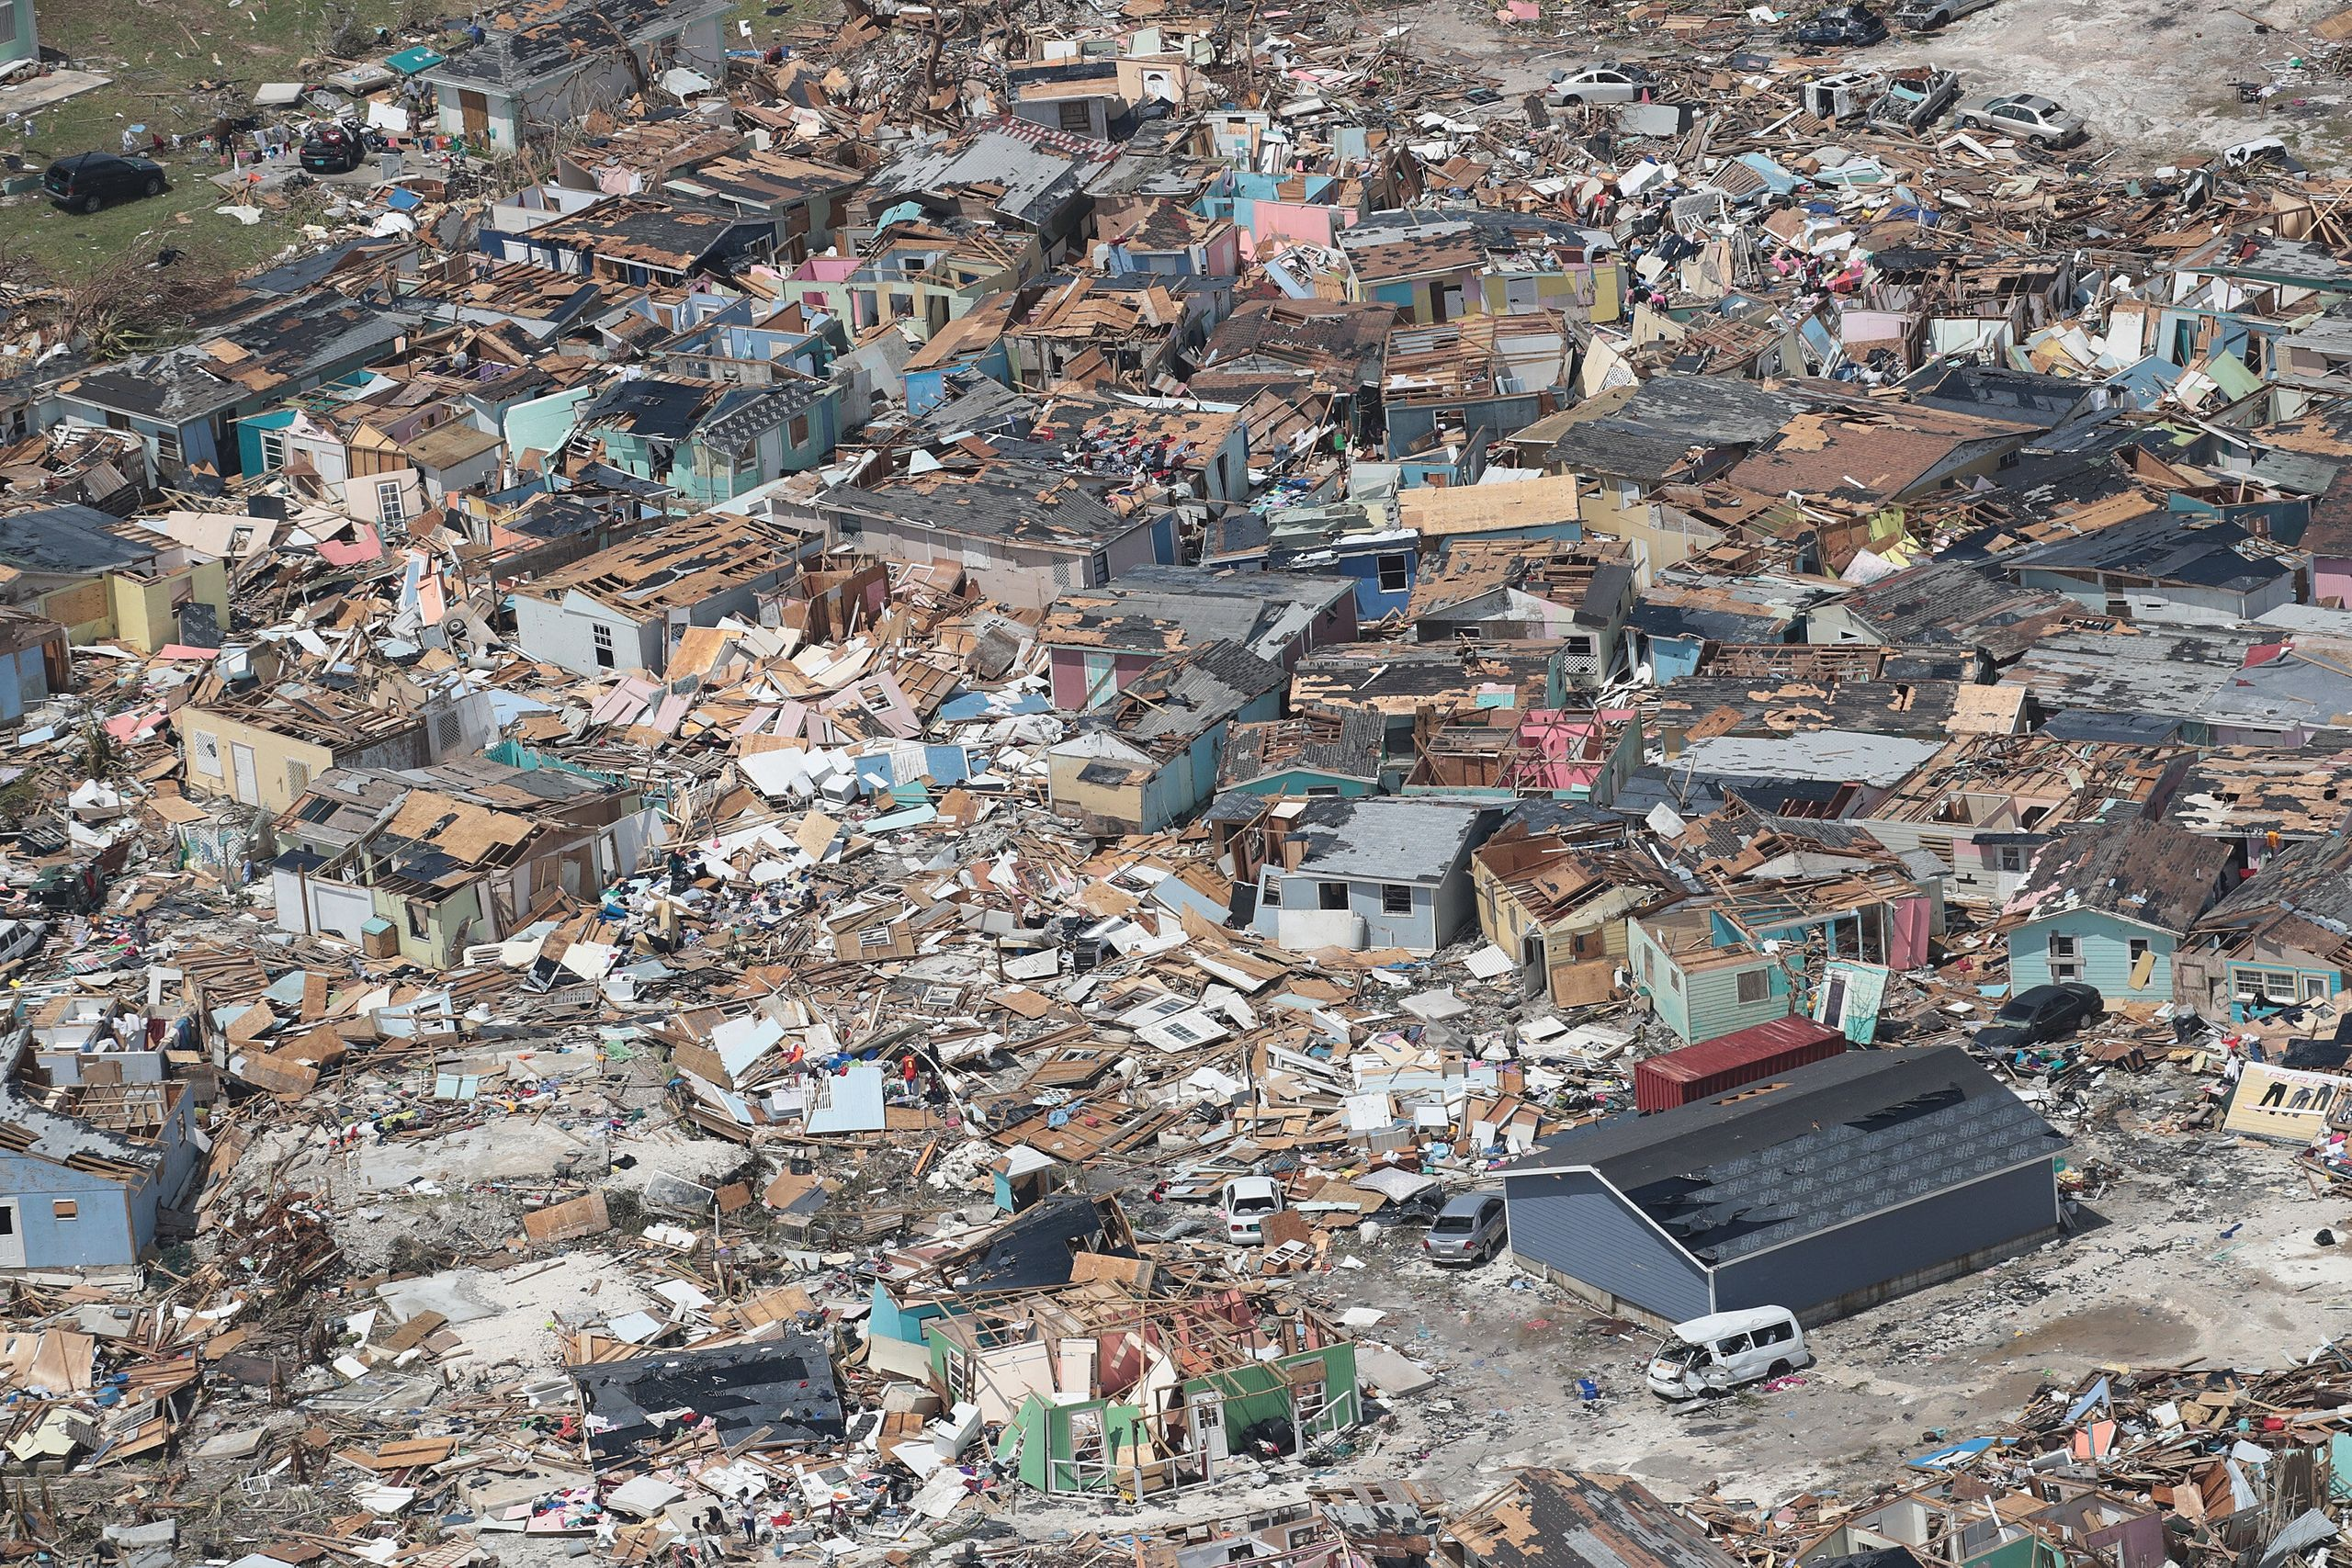 Westlake Legal Group 5d7162583b0000b140cf2941 Dramatic Images Show Hurricane Dorian Destruction From Above